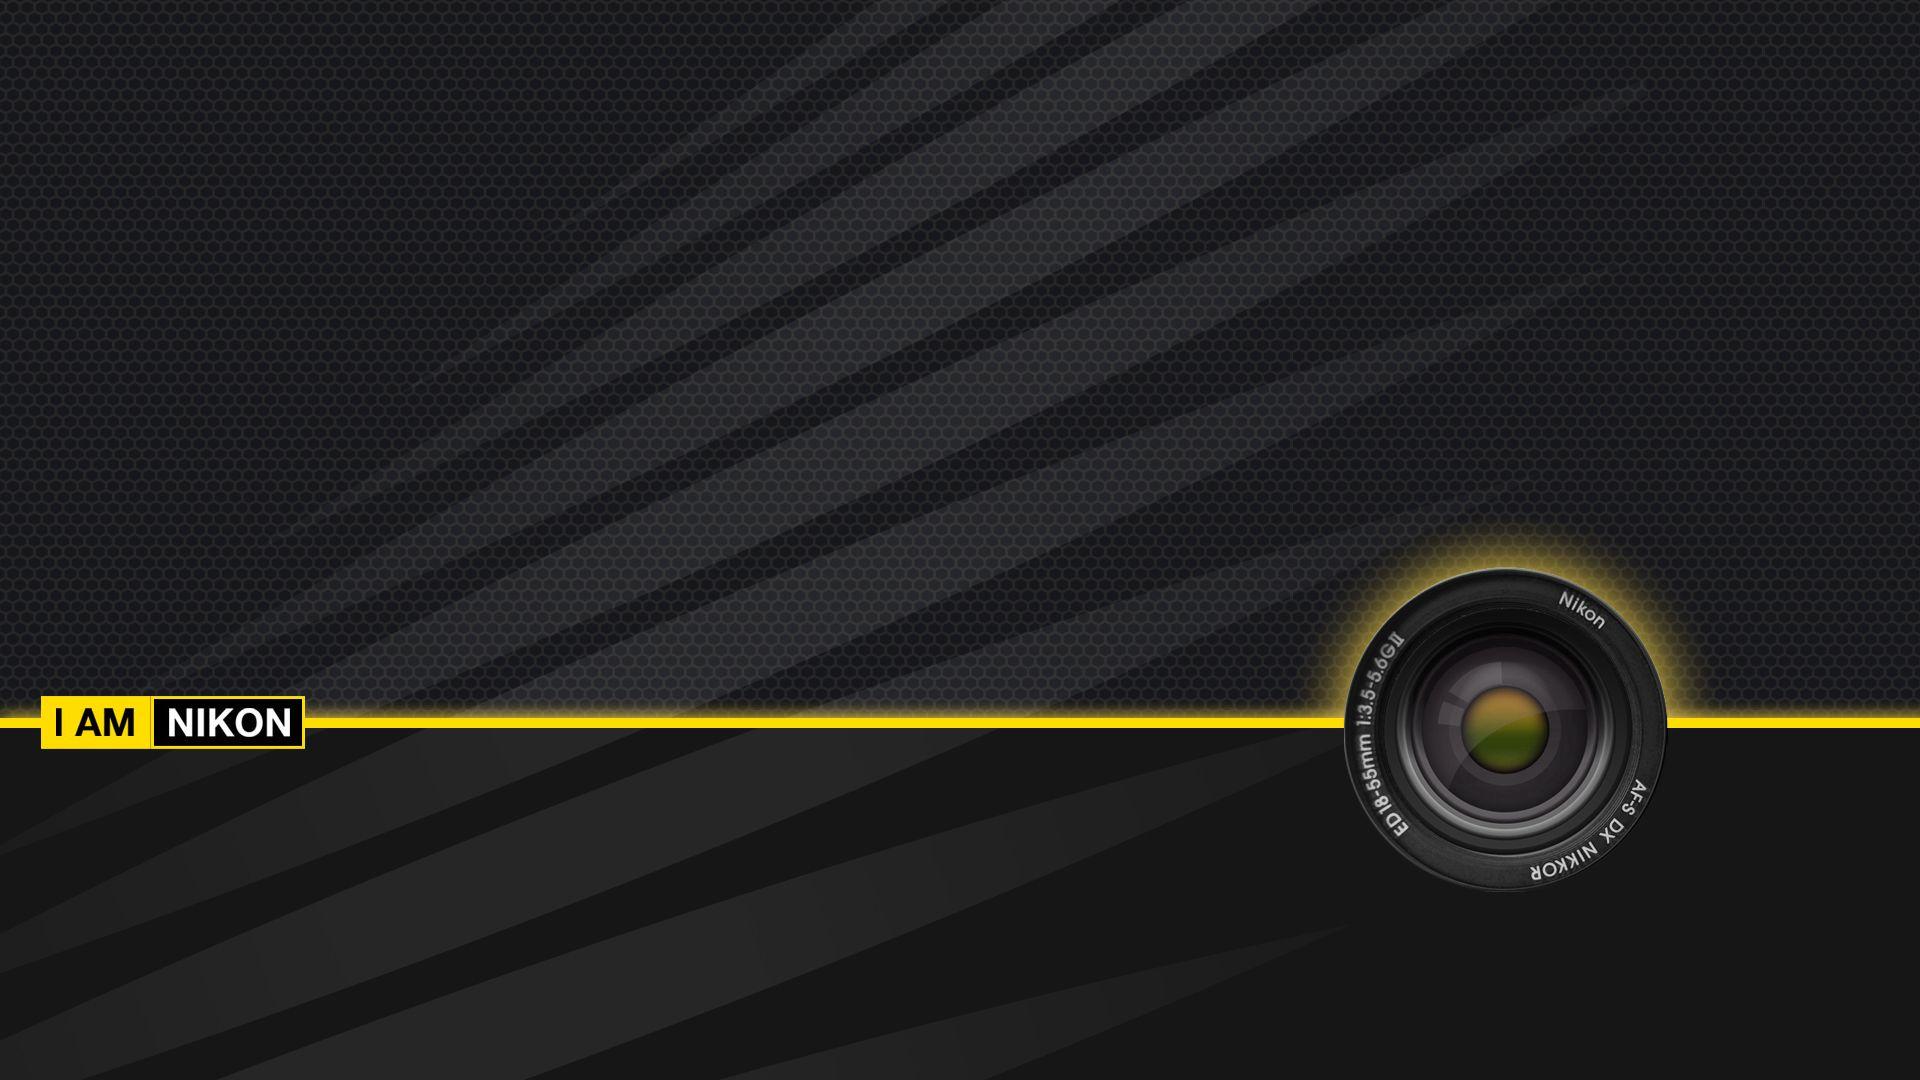 Nikon Wallpaper 1 Jpg 1920 1080 Logo Background Picture Logo